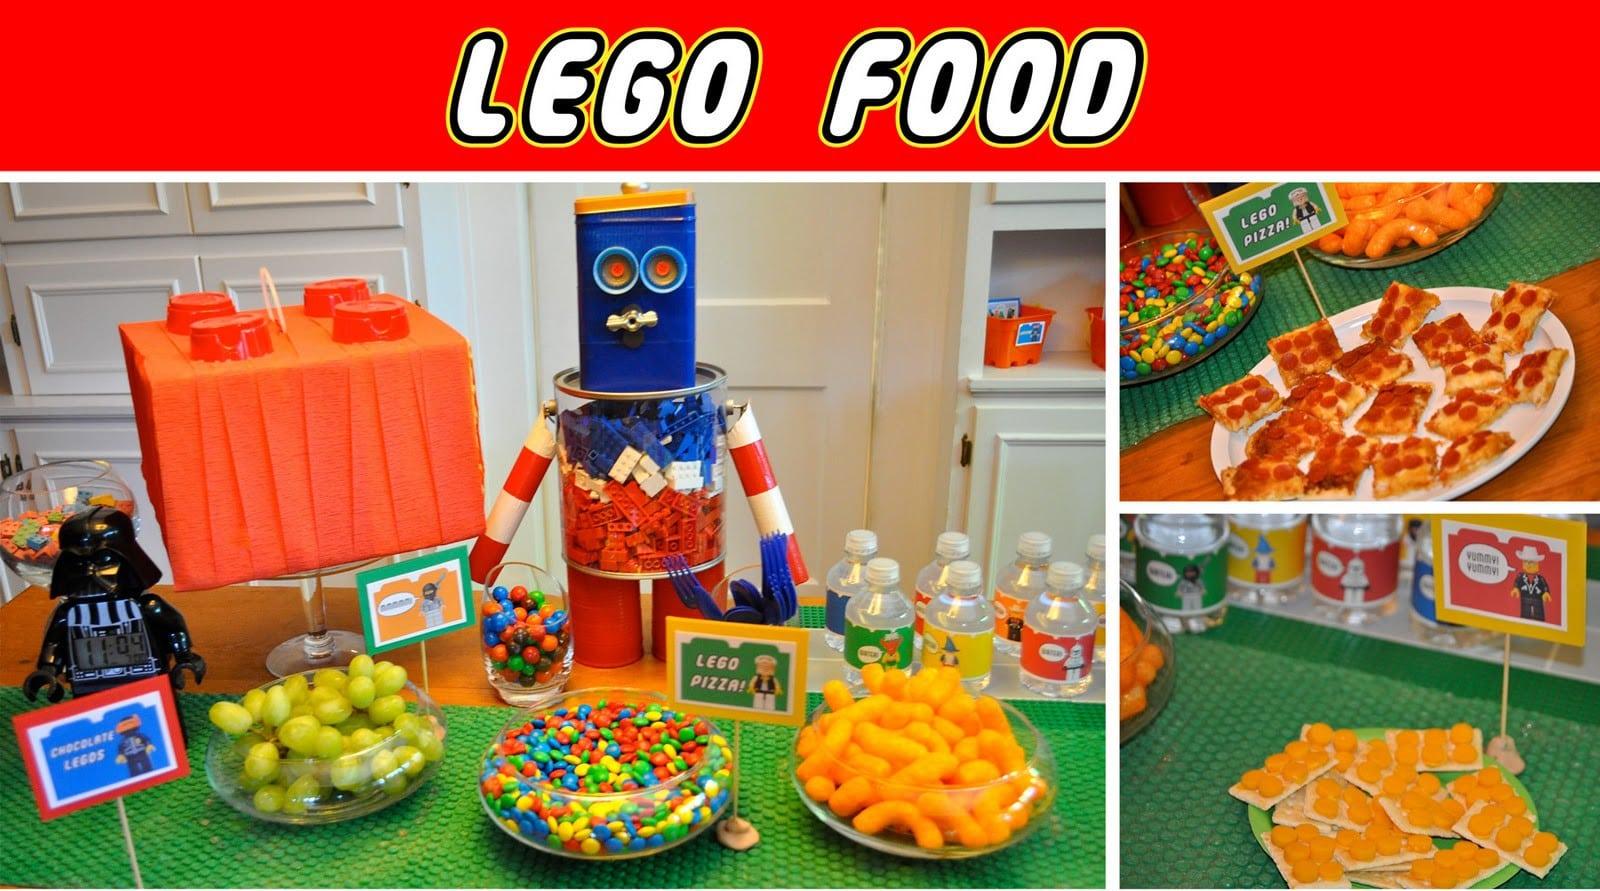 Star Wars Lego Birthday Invitations Printable Free 3 400 X 222 640 356 1600 891